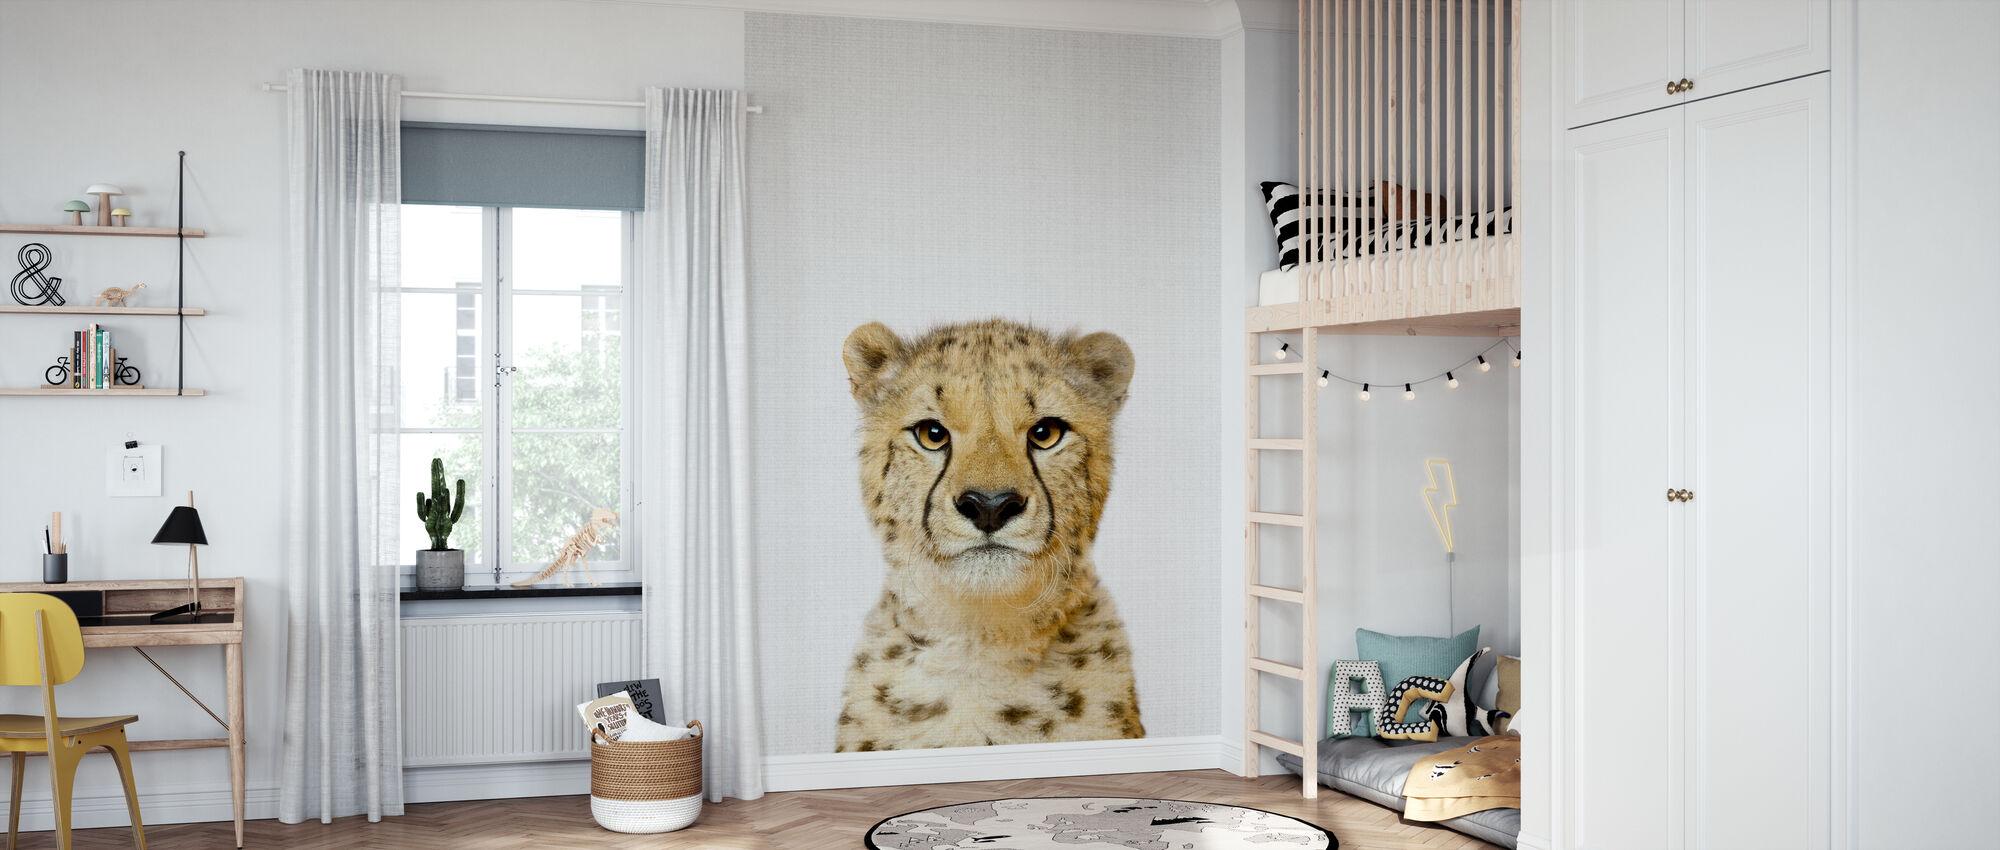 Cheetah - Wallpaper - Kids Room